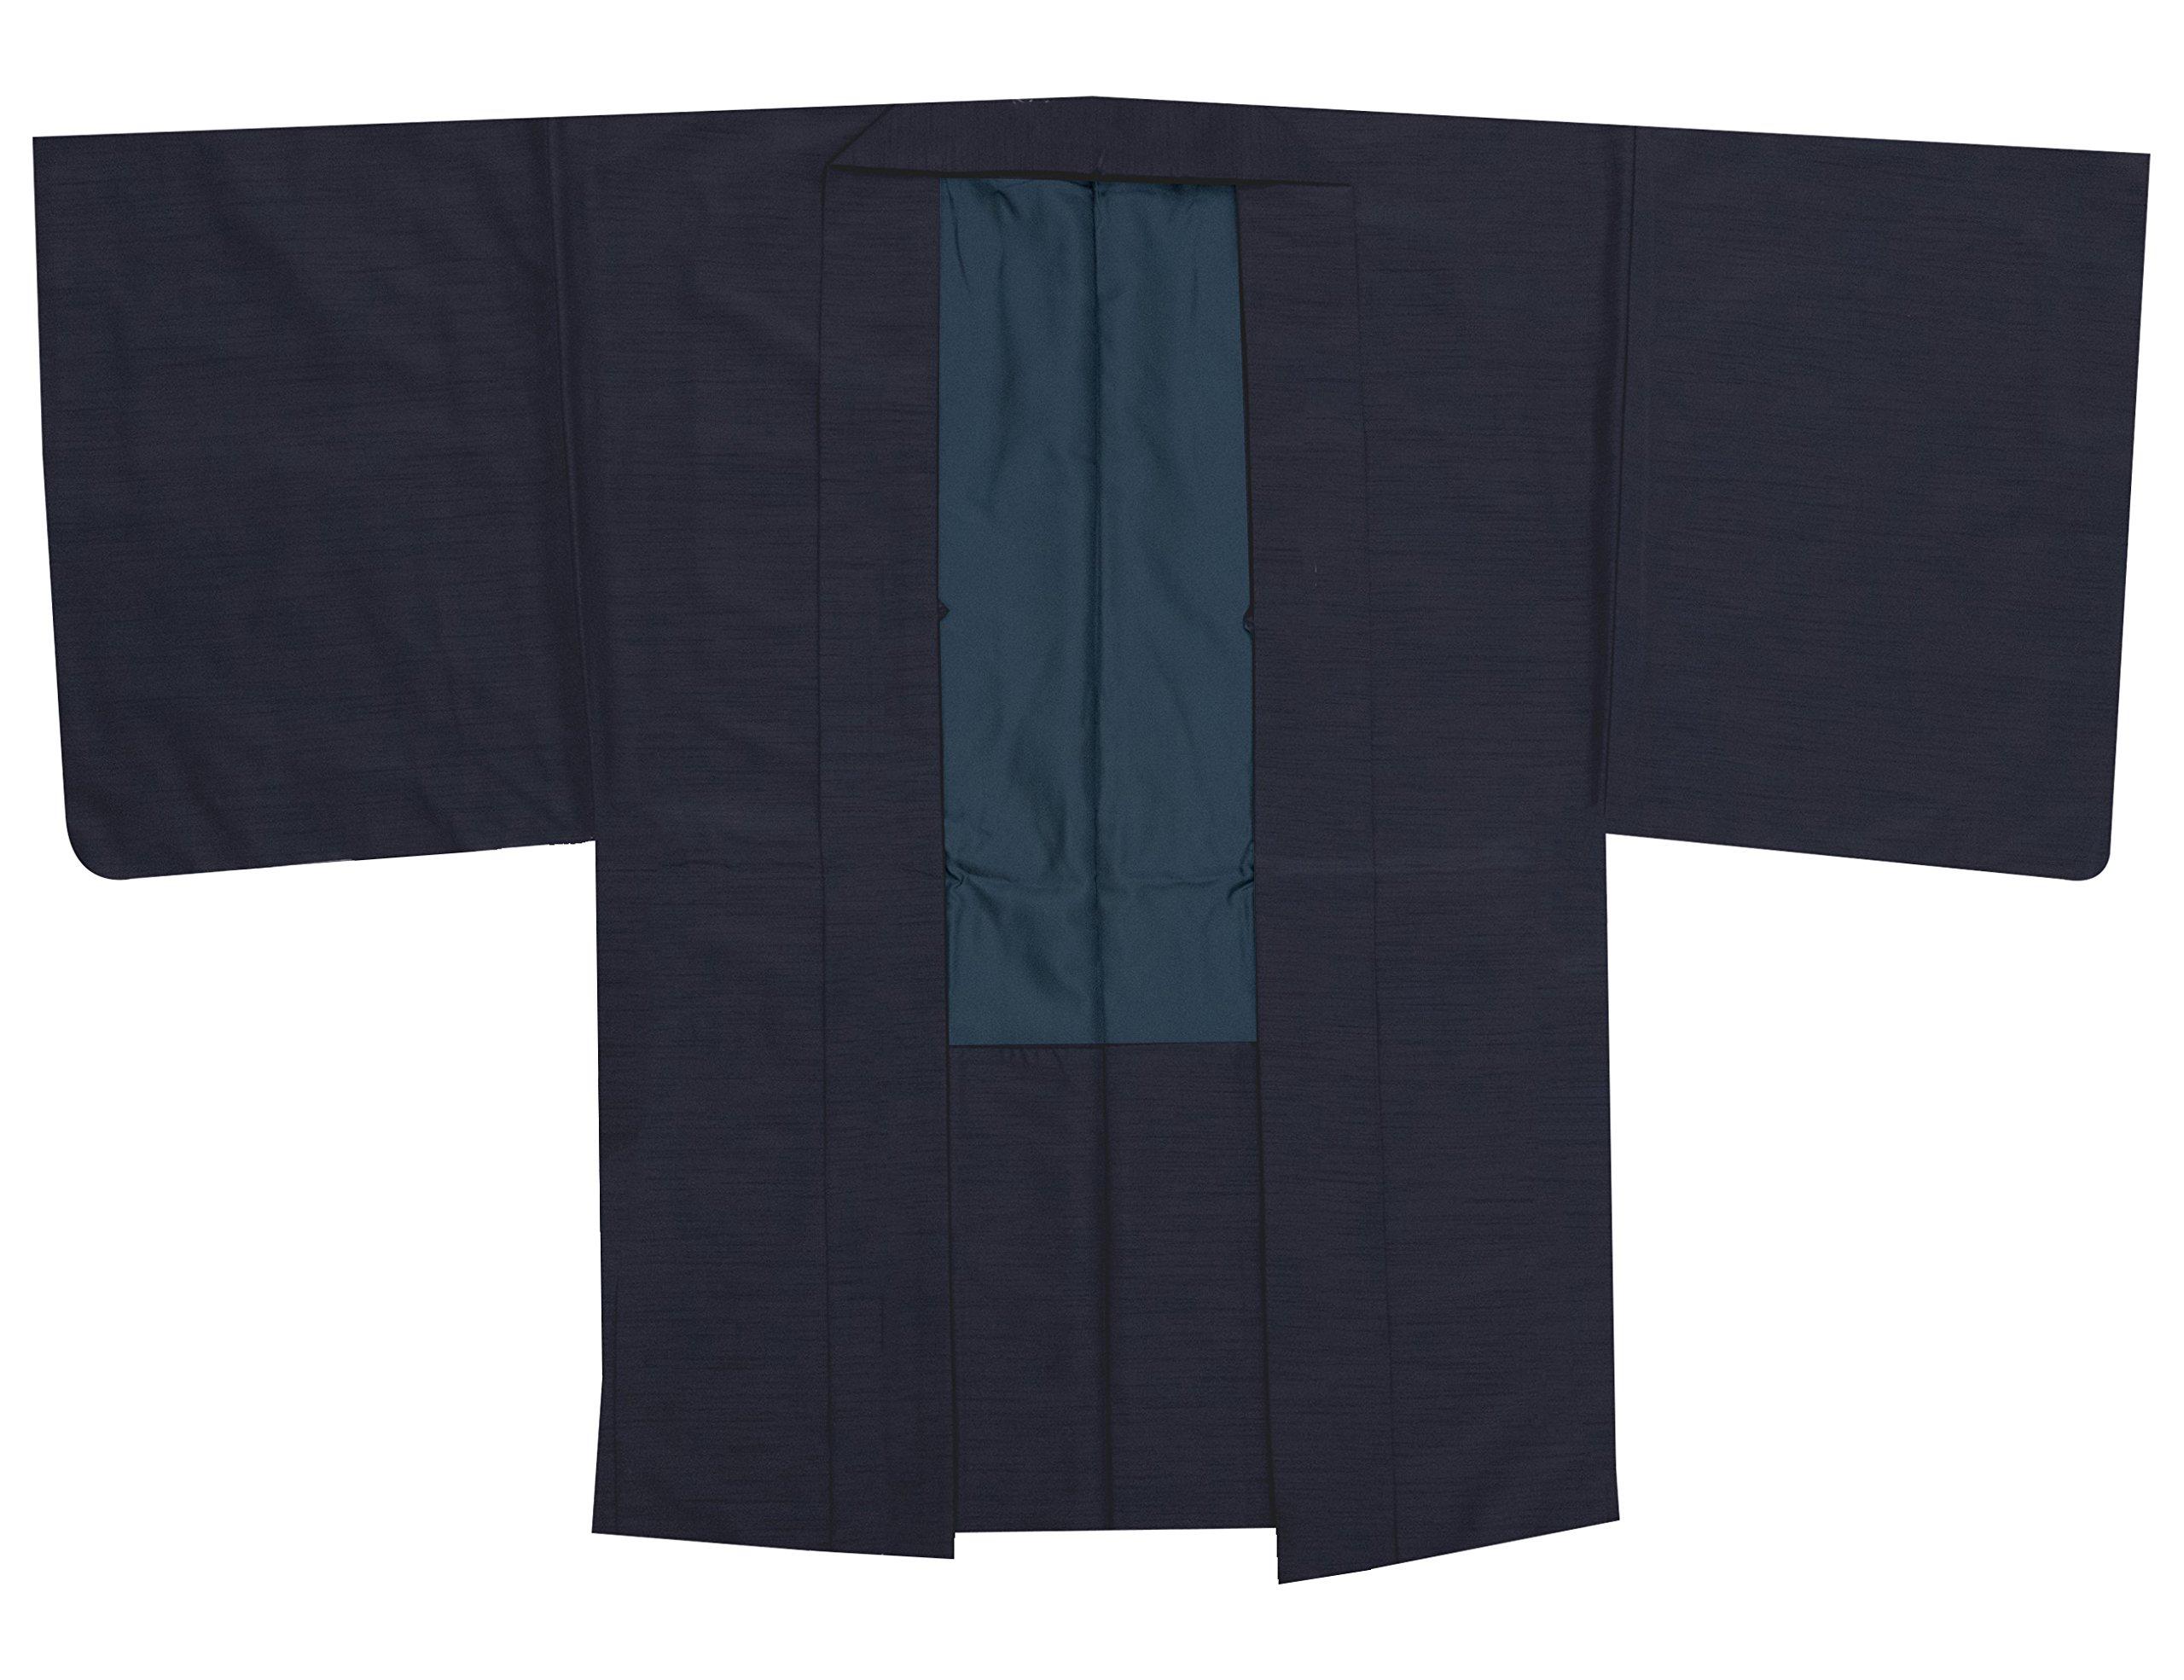 bbdef03f55da2c [キョウエツ] 羽織 洗える 袷 無地 紬生地 単品 メンズ product image